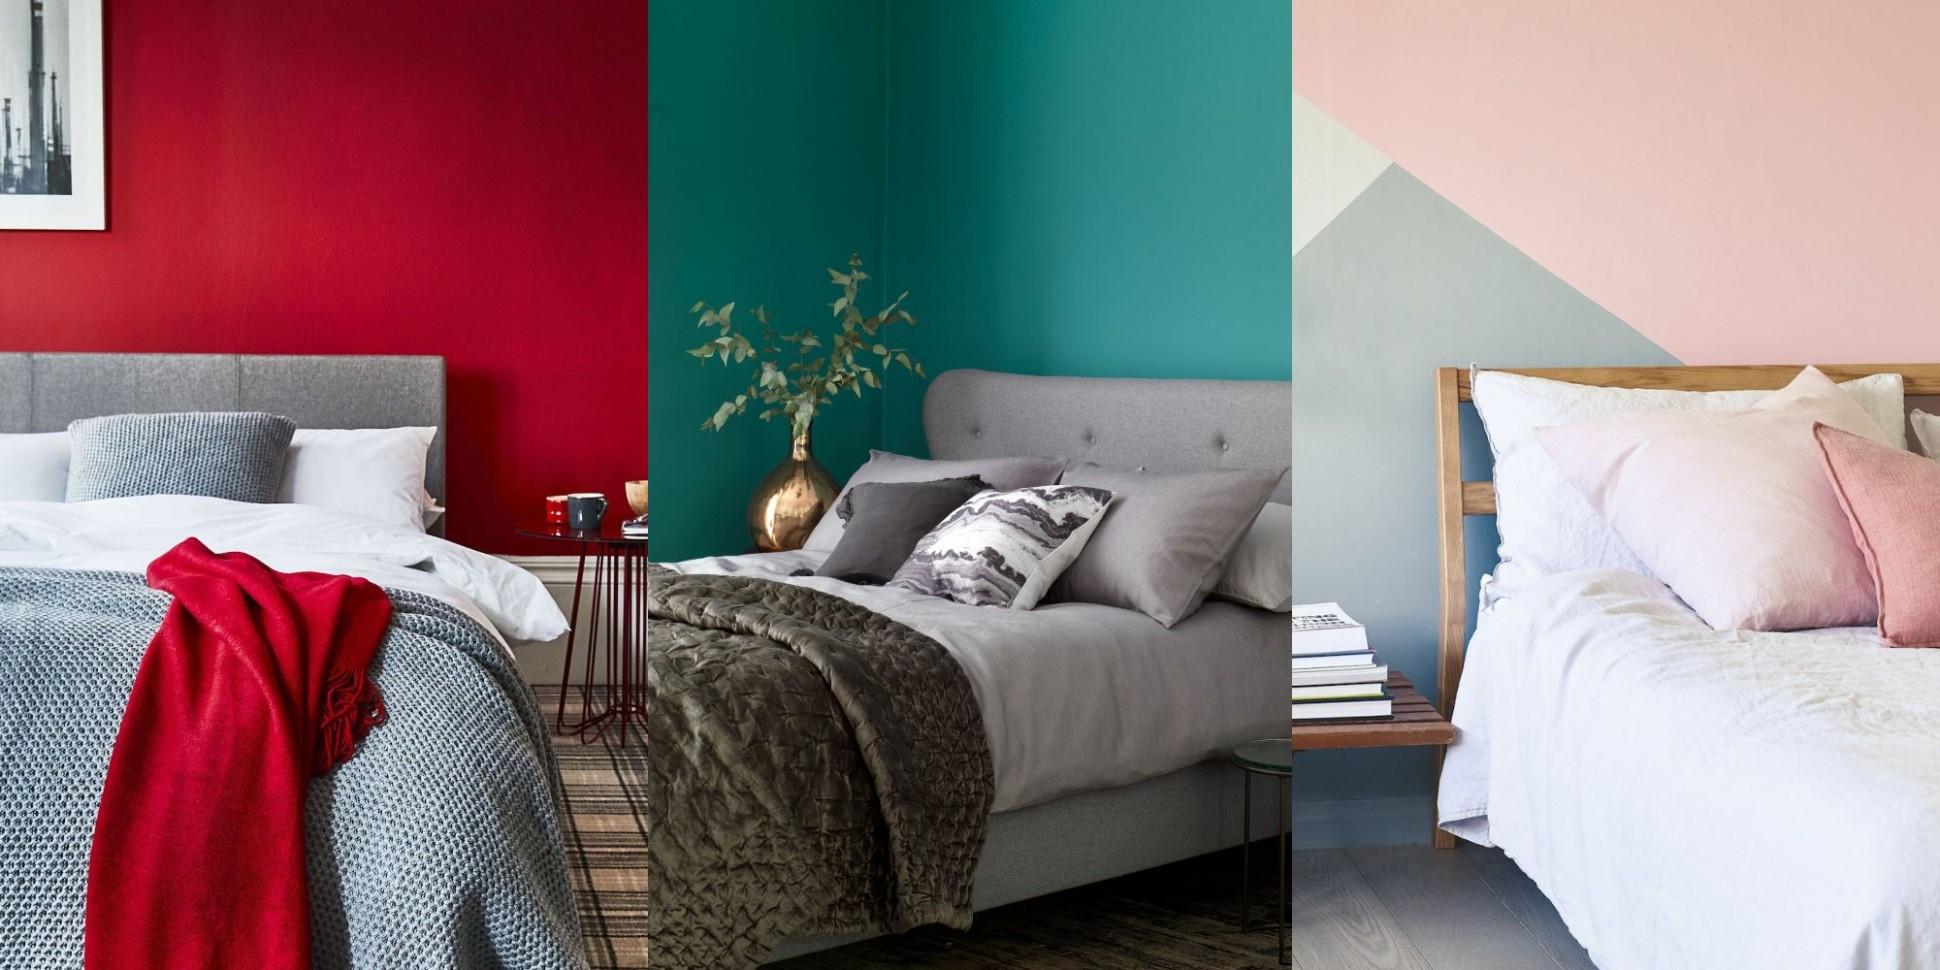 9 Bedroom Colour Ideas - Bedroom Paint Ideas - Bedroom Colour Ideas